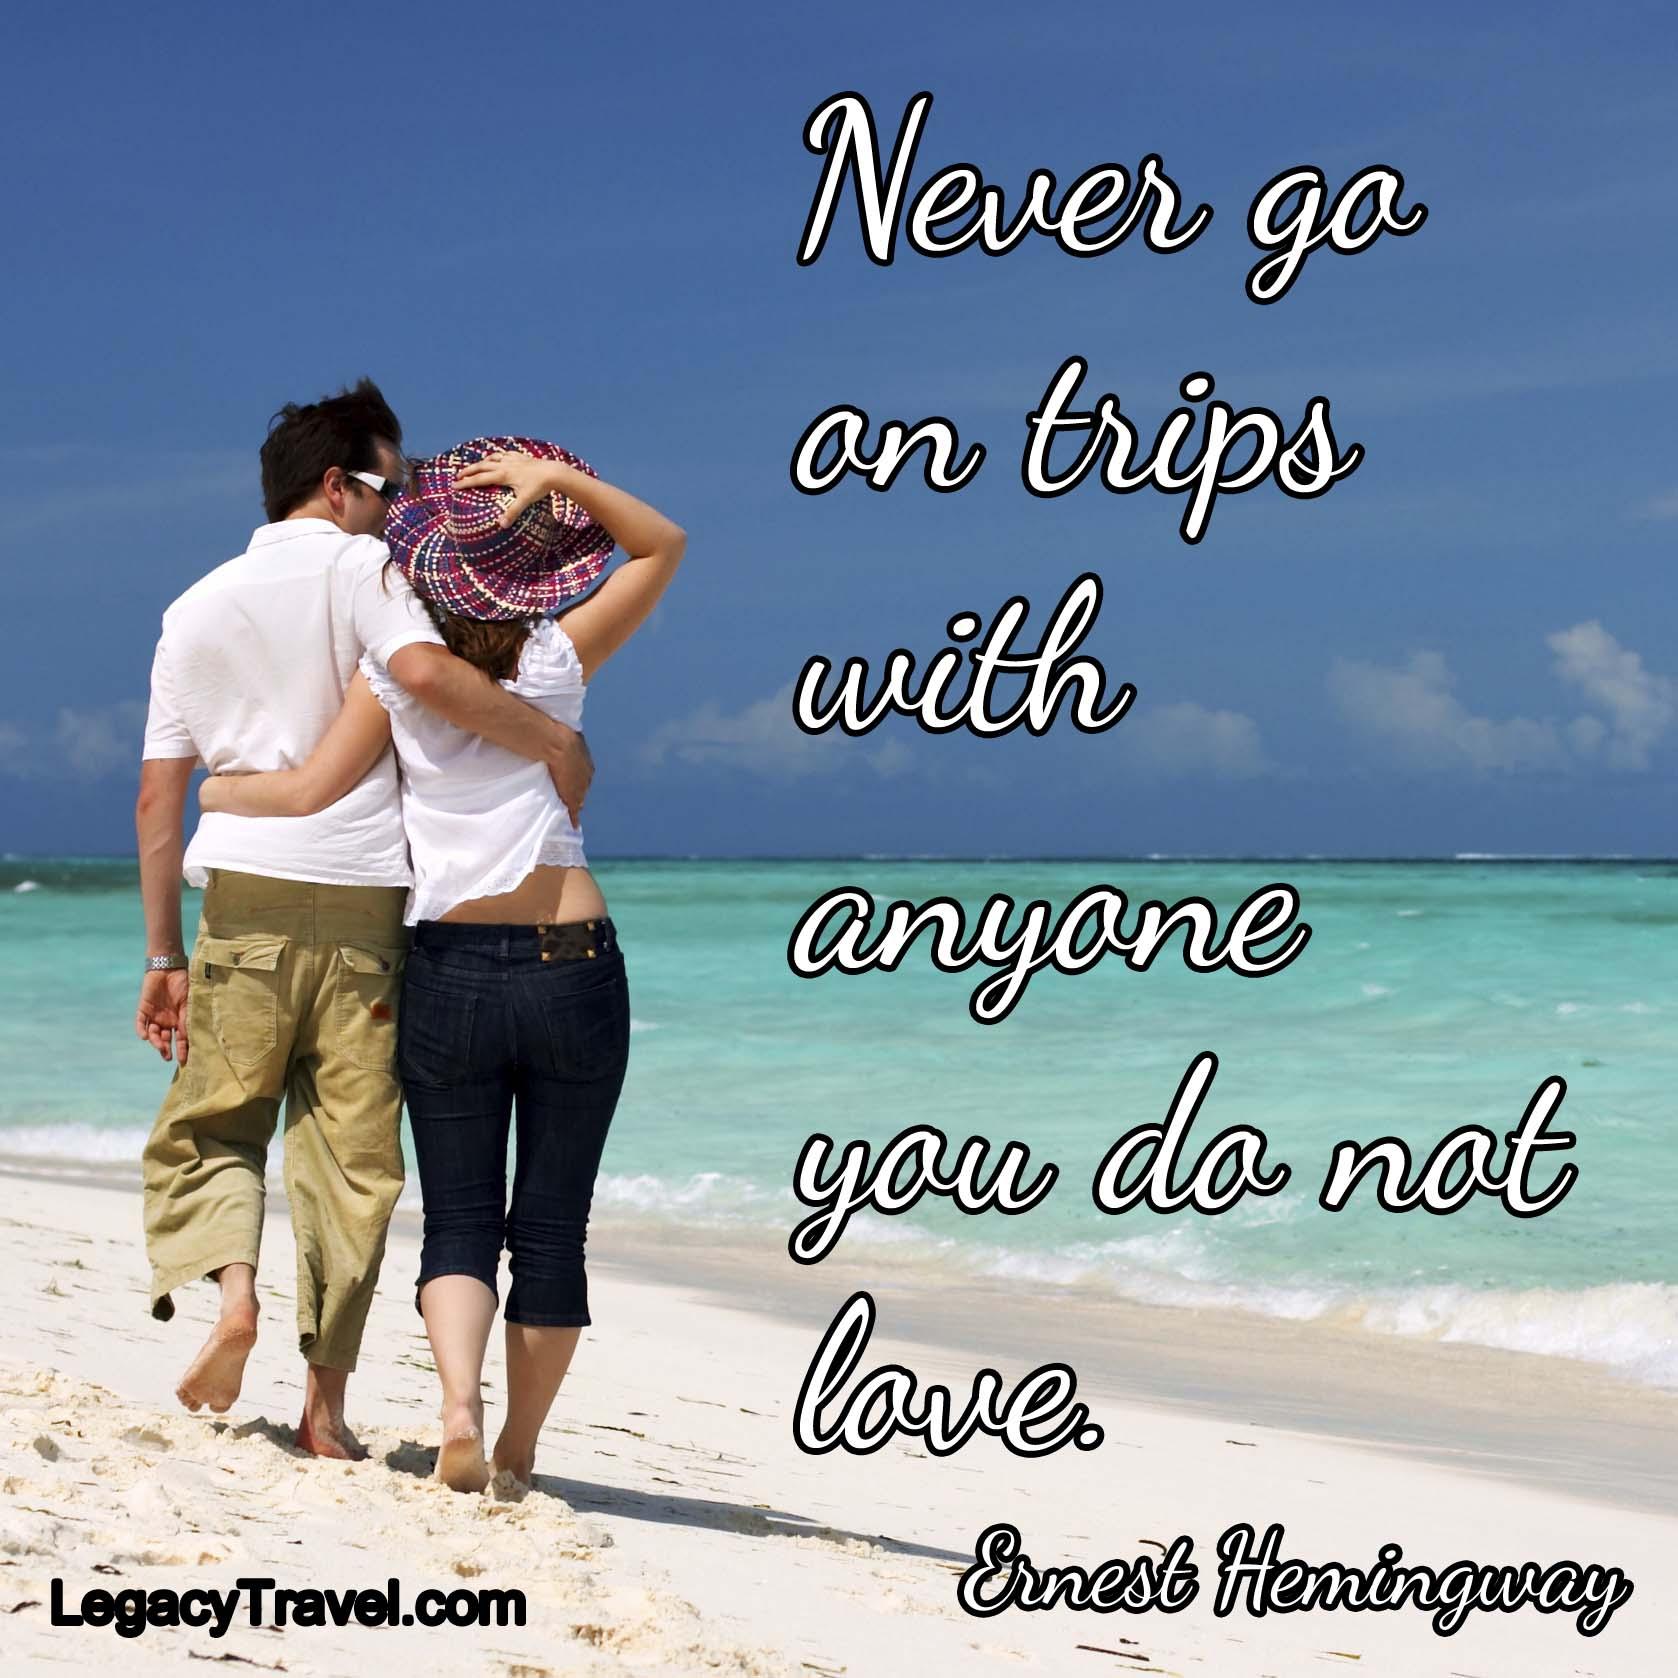 Hemingway Us Agencies Quotes